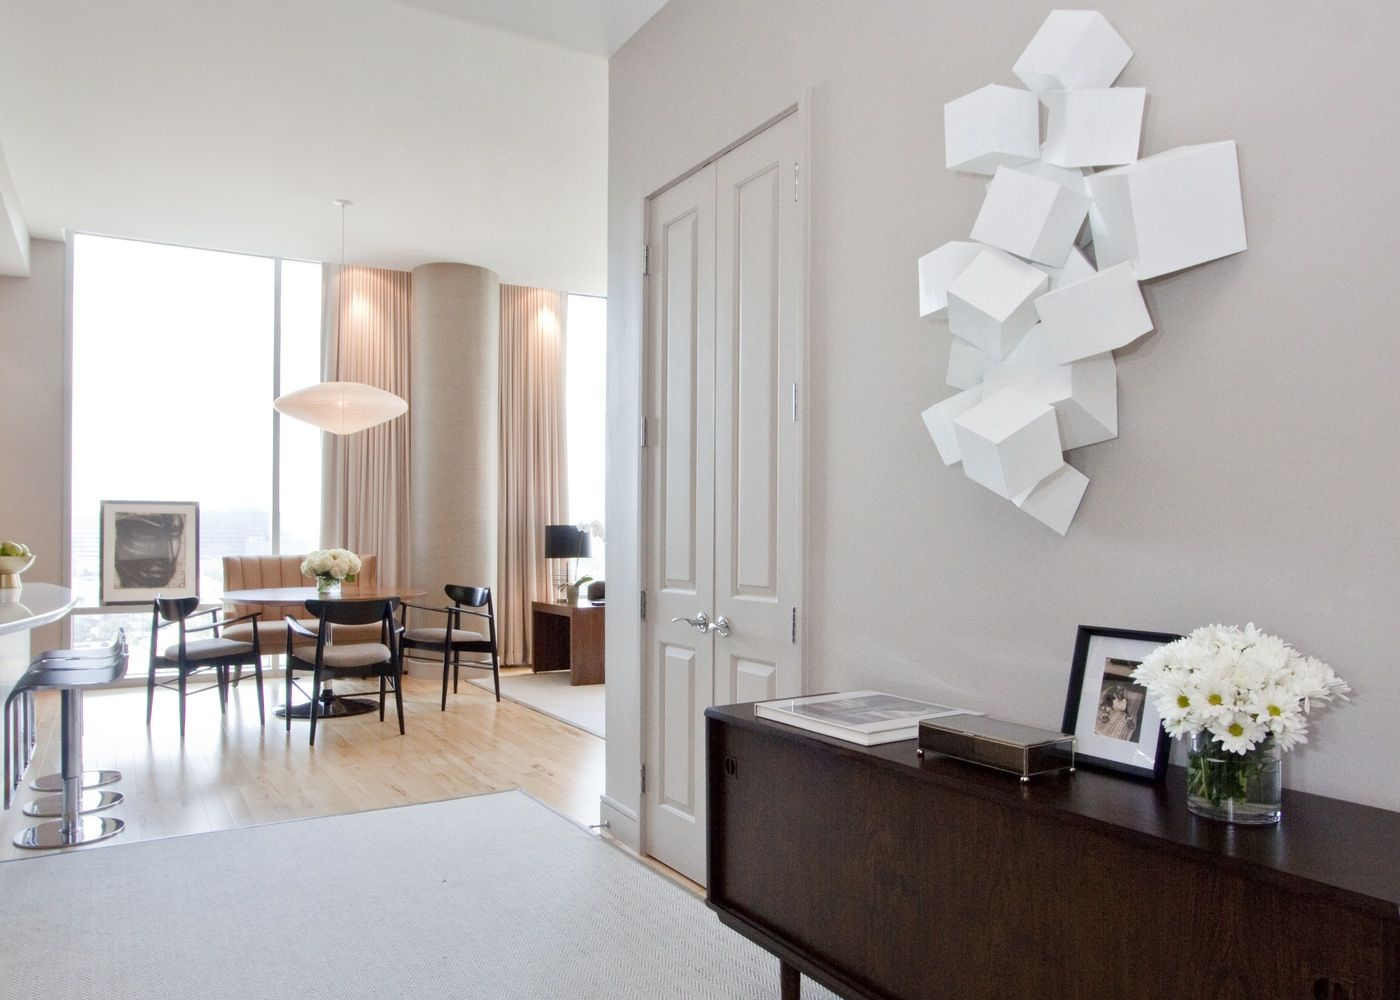 2727 Kirby - Houston, Texas by Blair Gordon Design - Lookbook | Hall ...